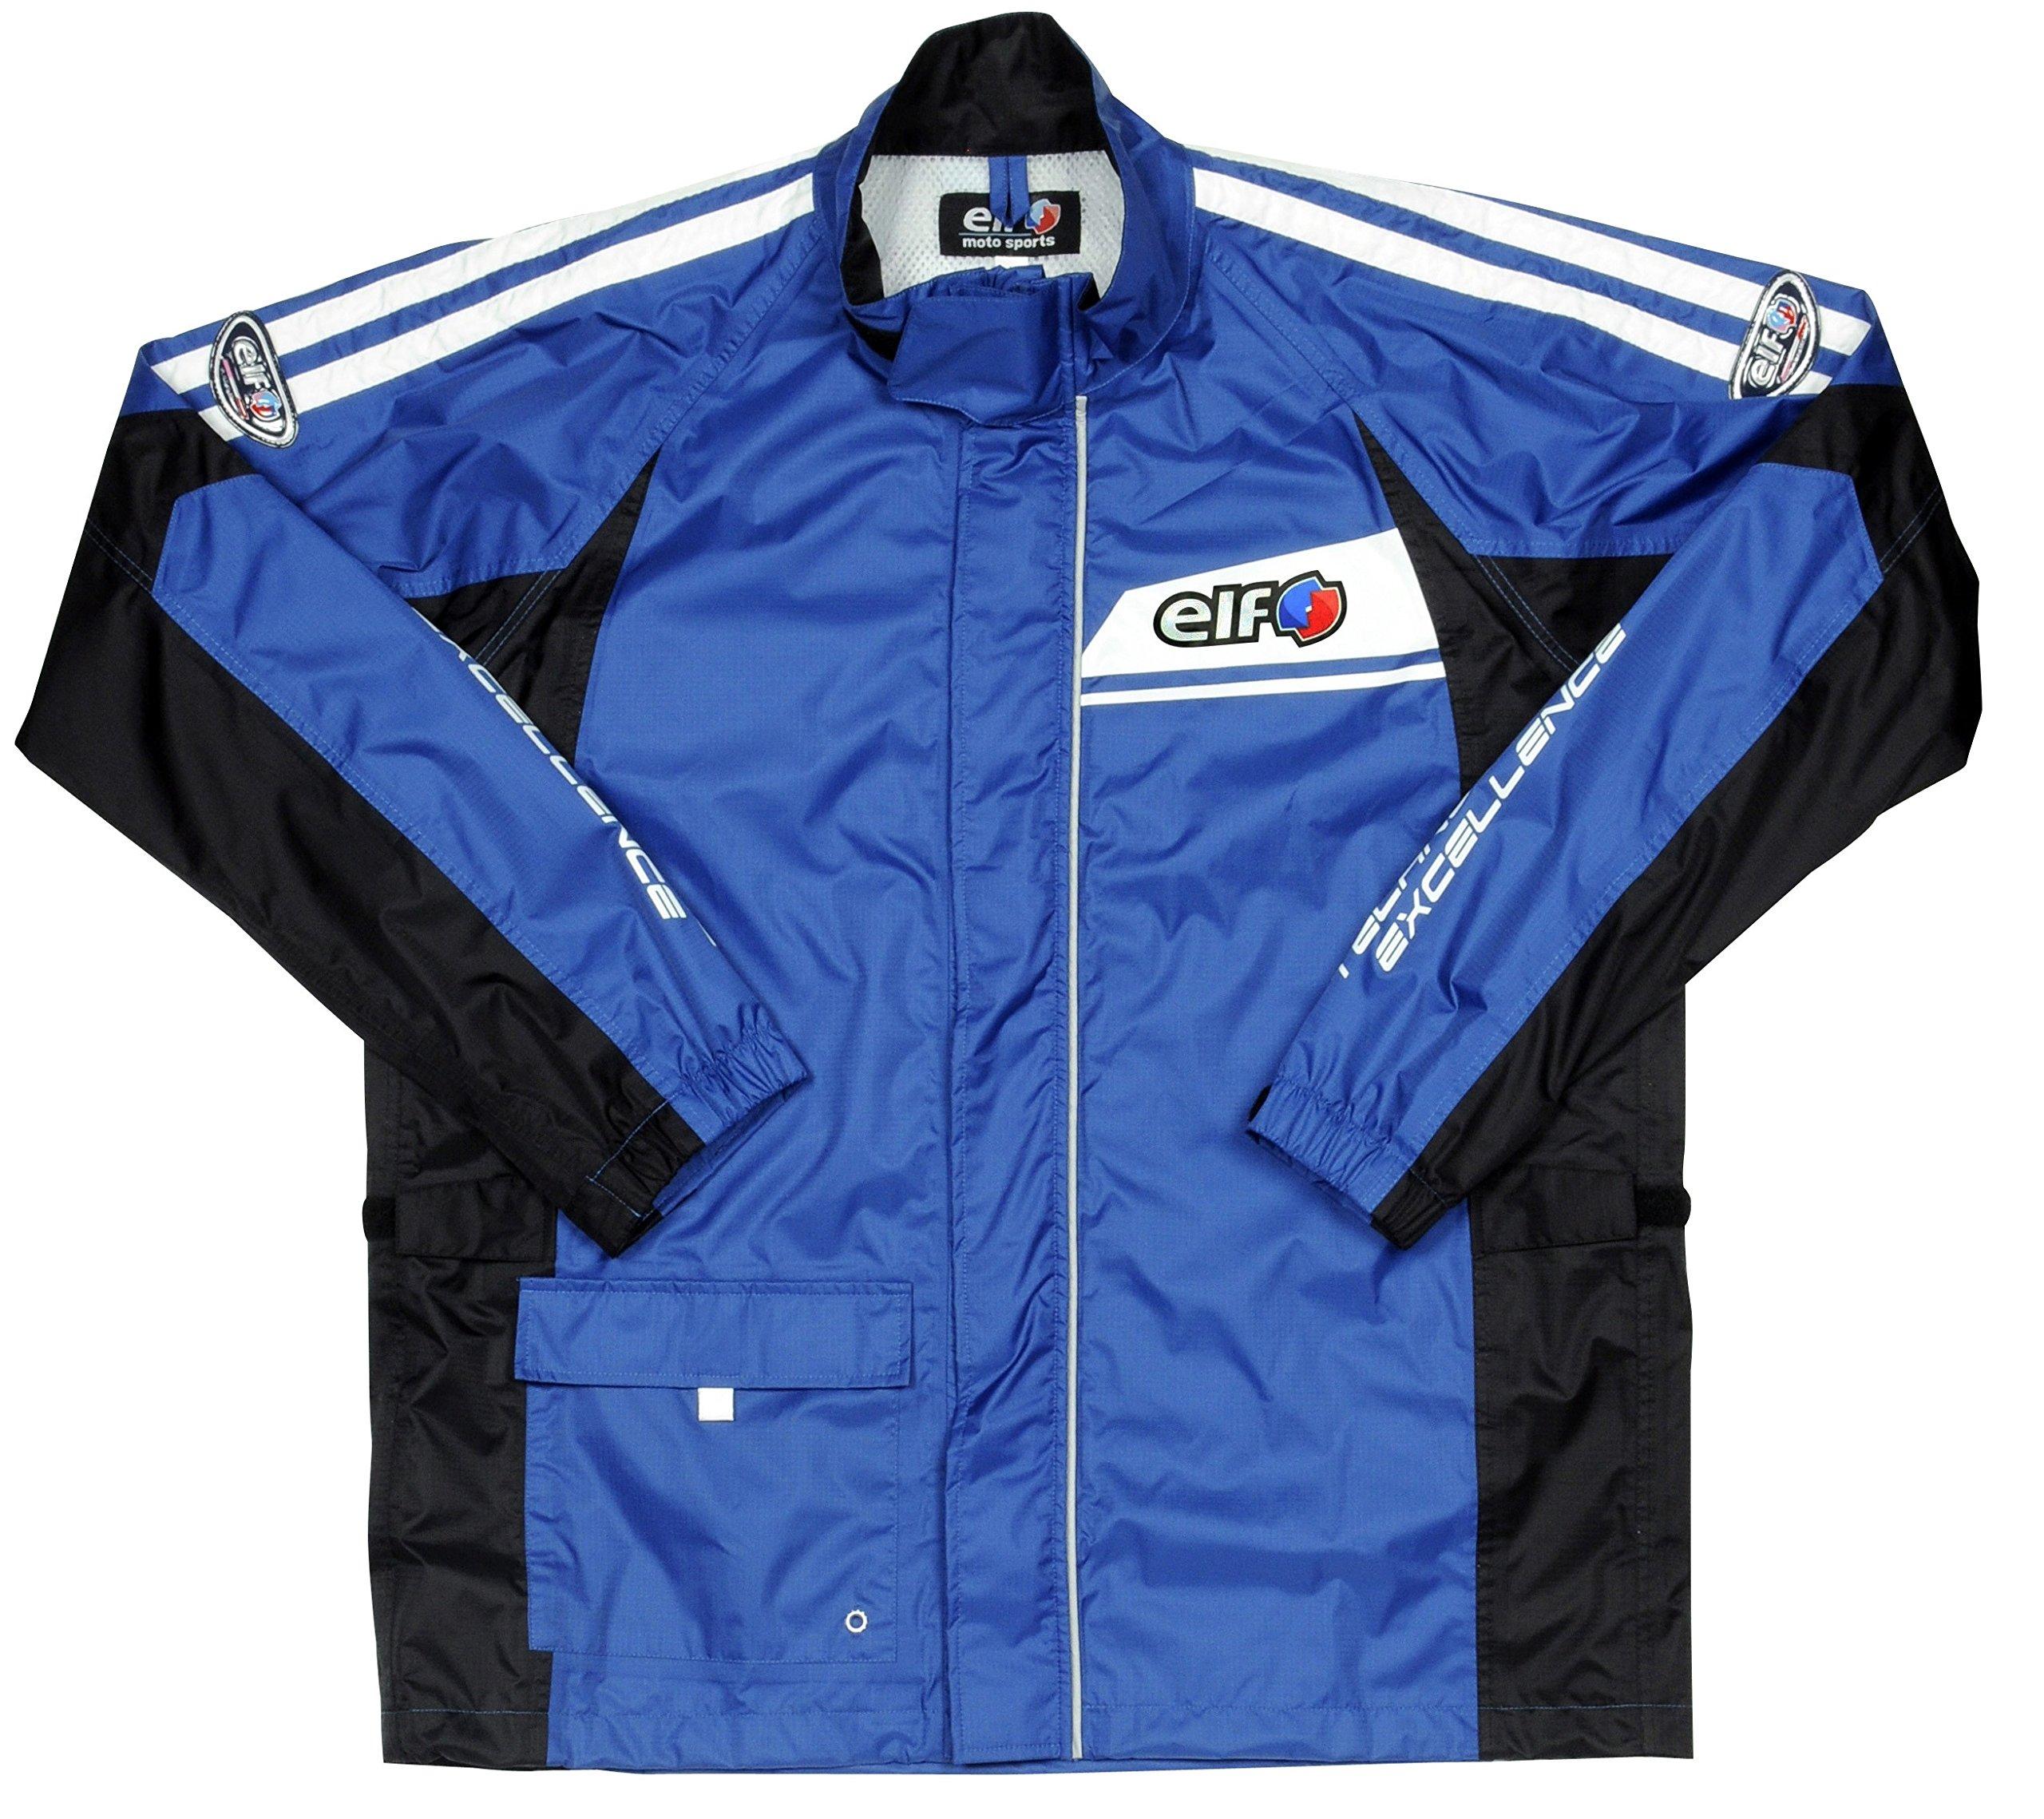 Elf rain suit Separate for (ELF) bike Blue LL ELR-5291